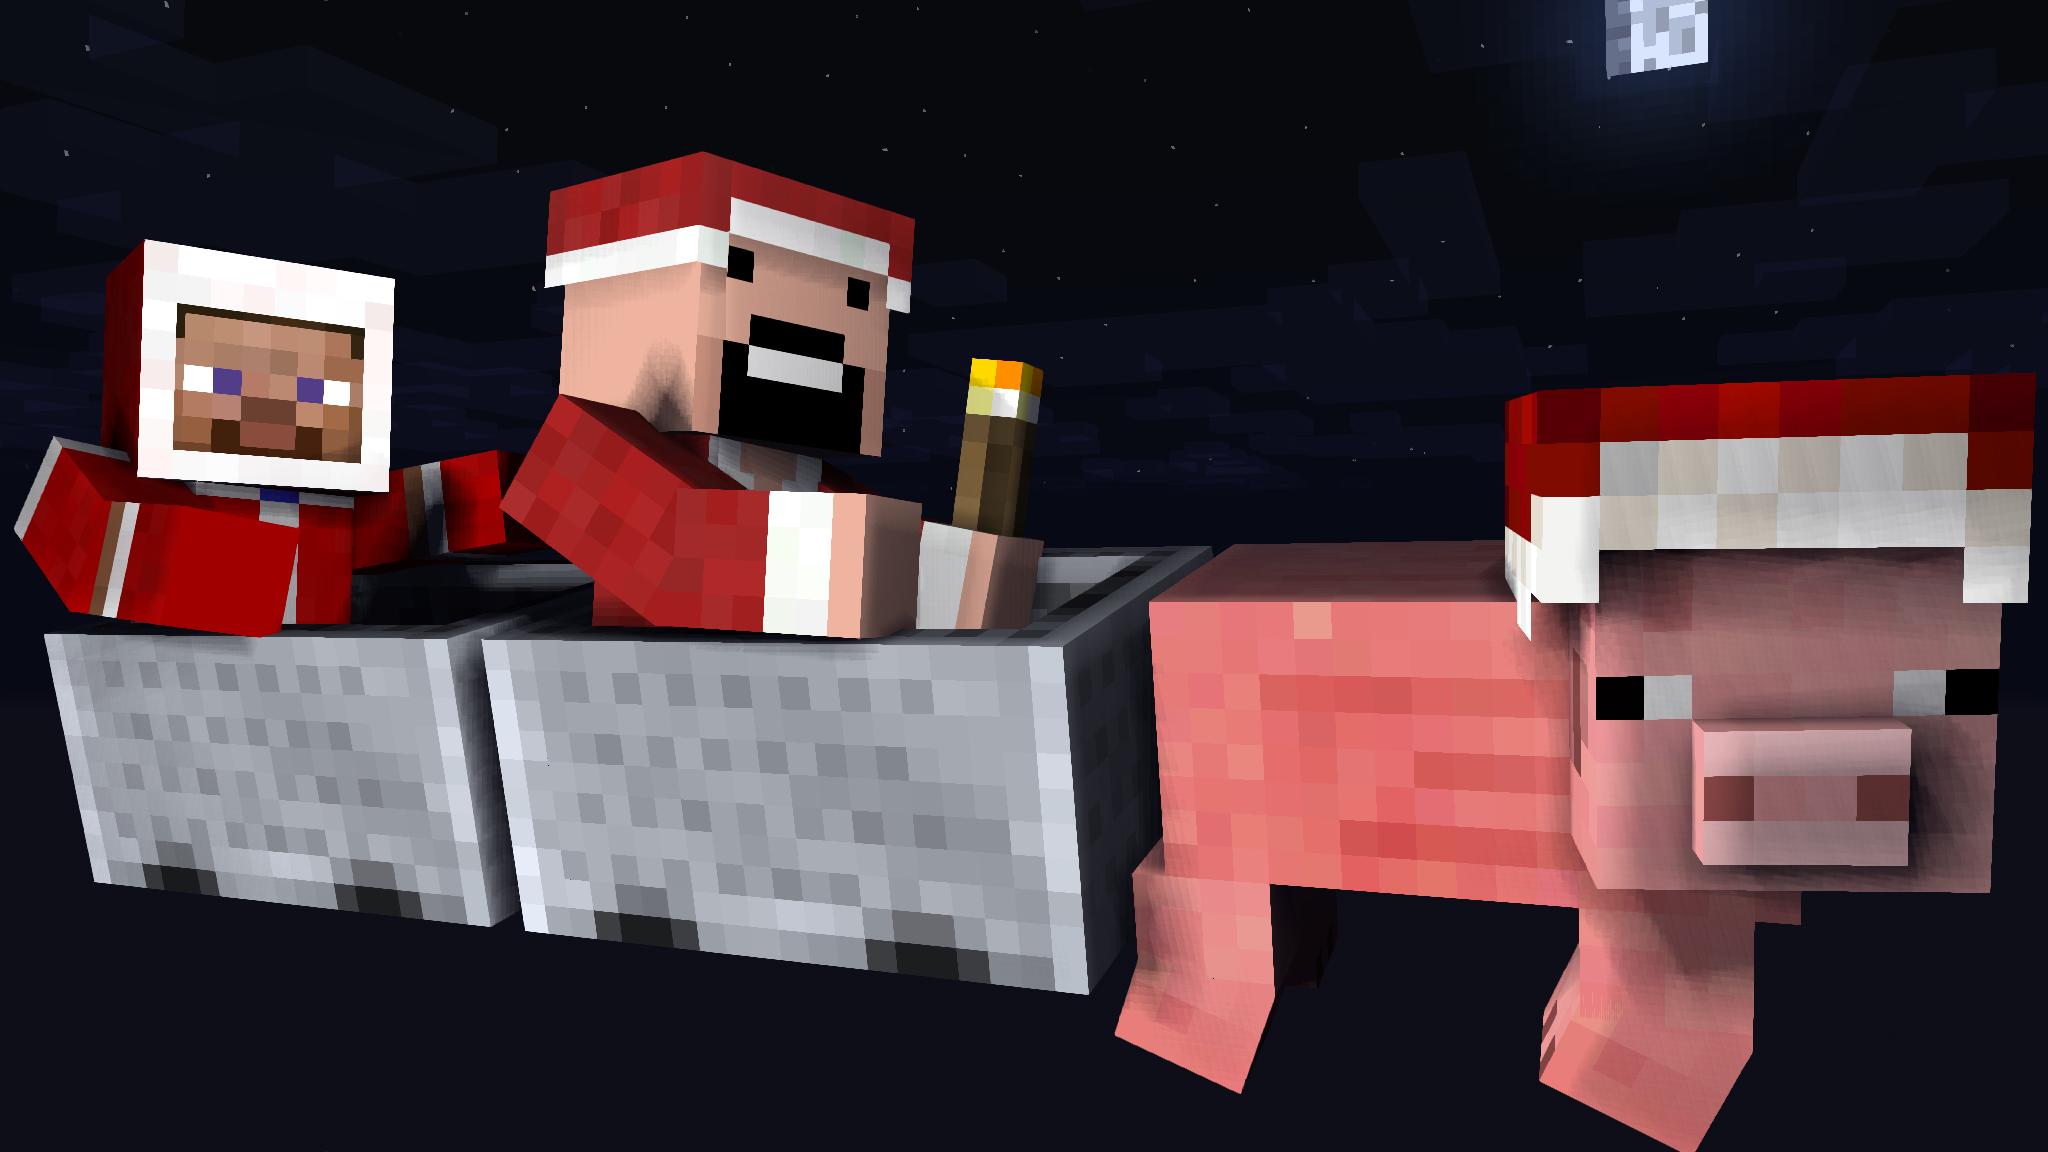 Wonderful Wallpaper Minecraft Christmas - 53542d3291f780a144159ec4022314c5-d8b5uv8  You Should Have_827153.png